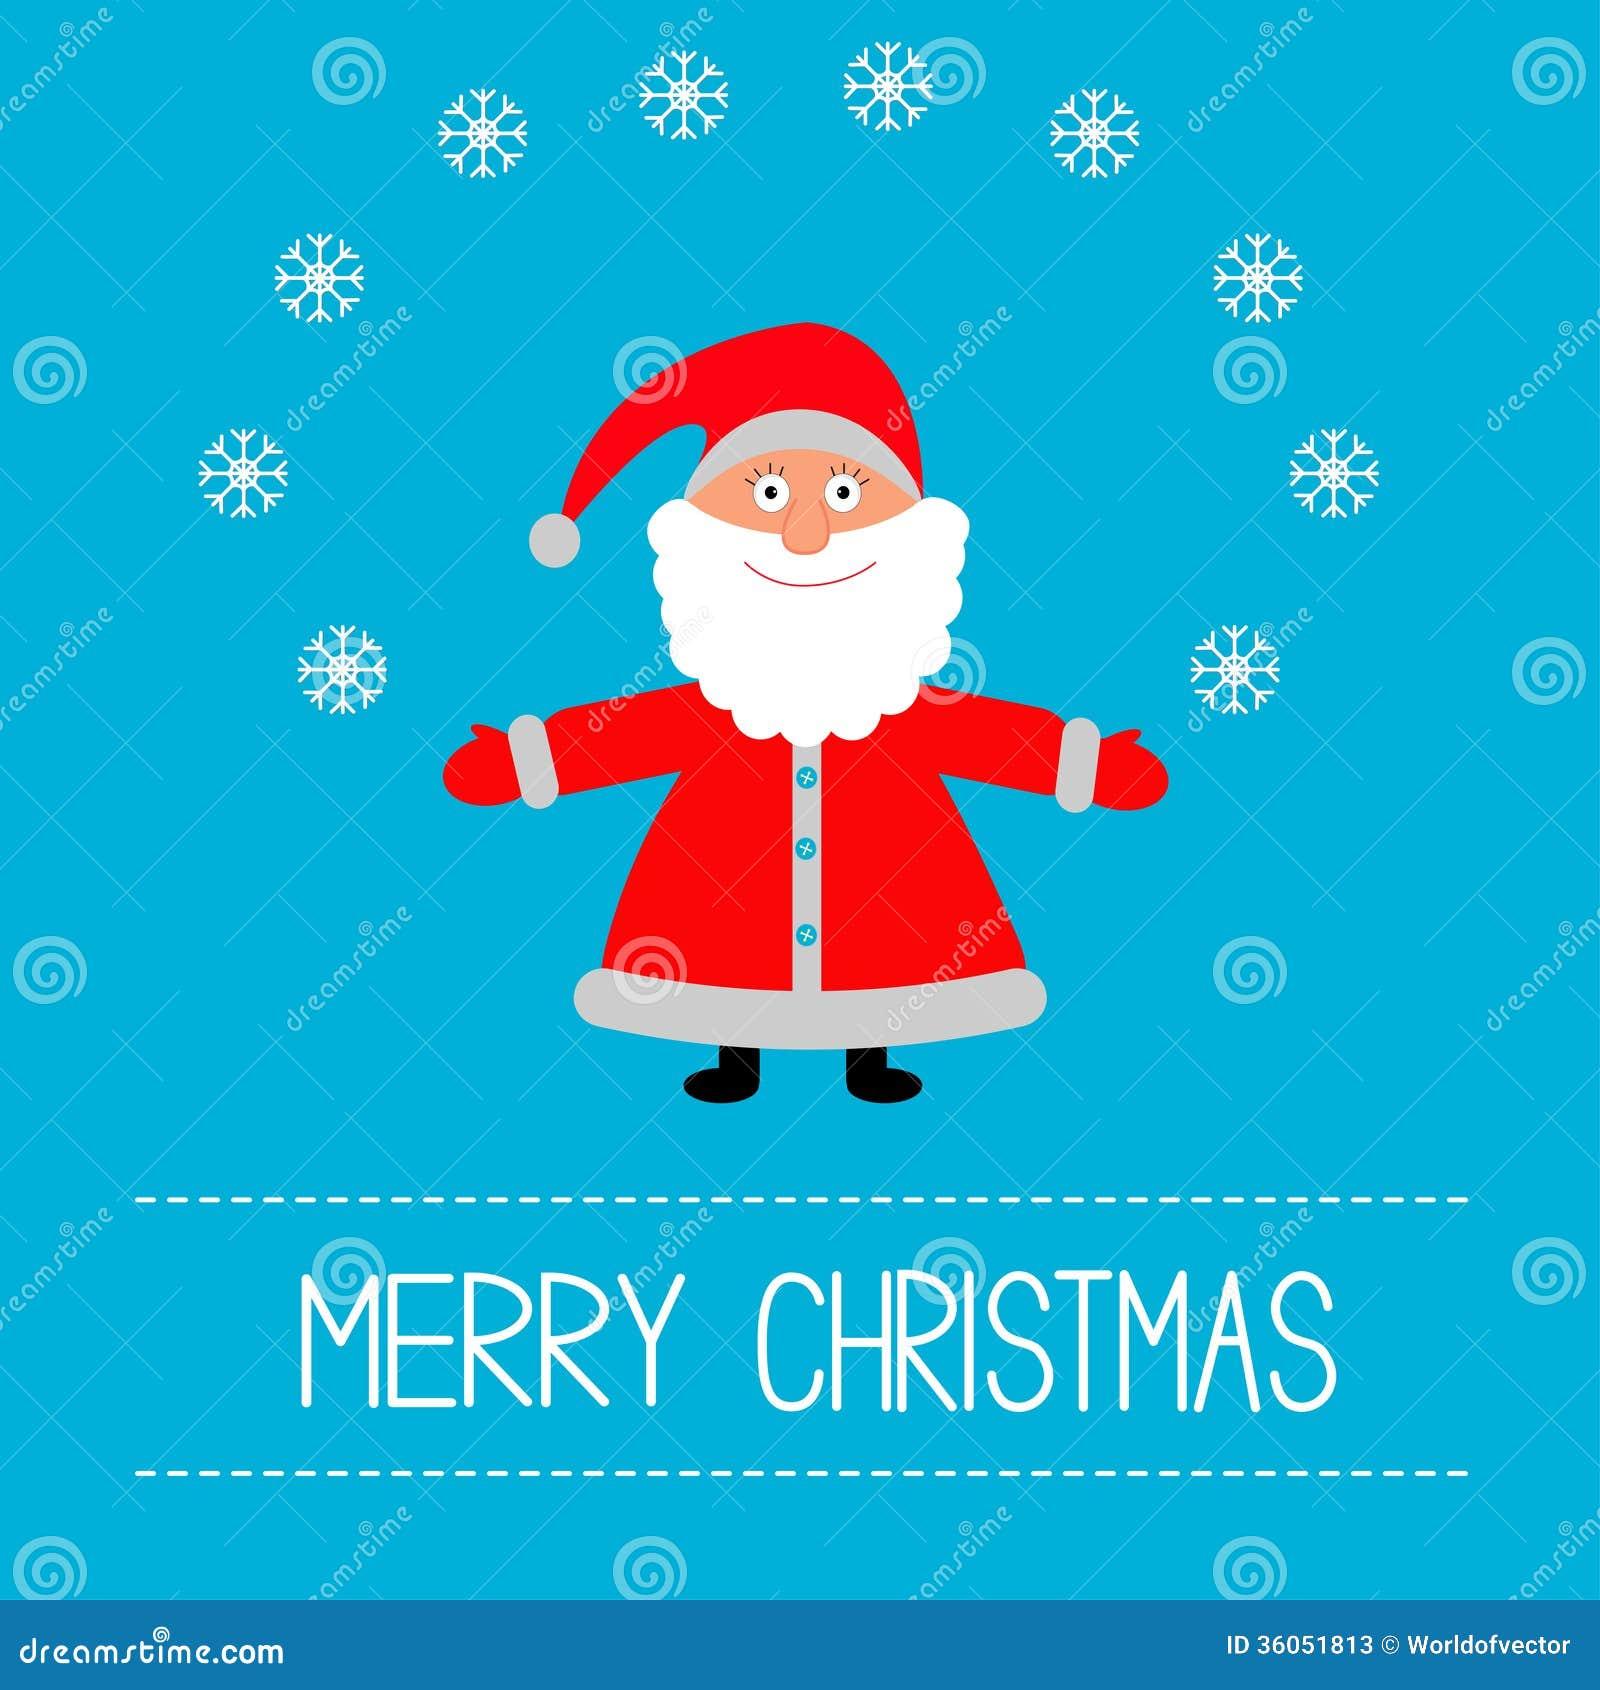 Cartoon santa claus and snowflakes merry christma stock